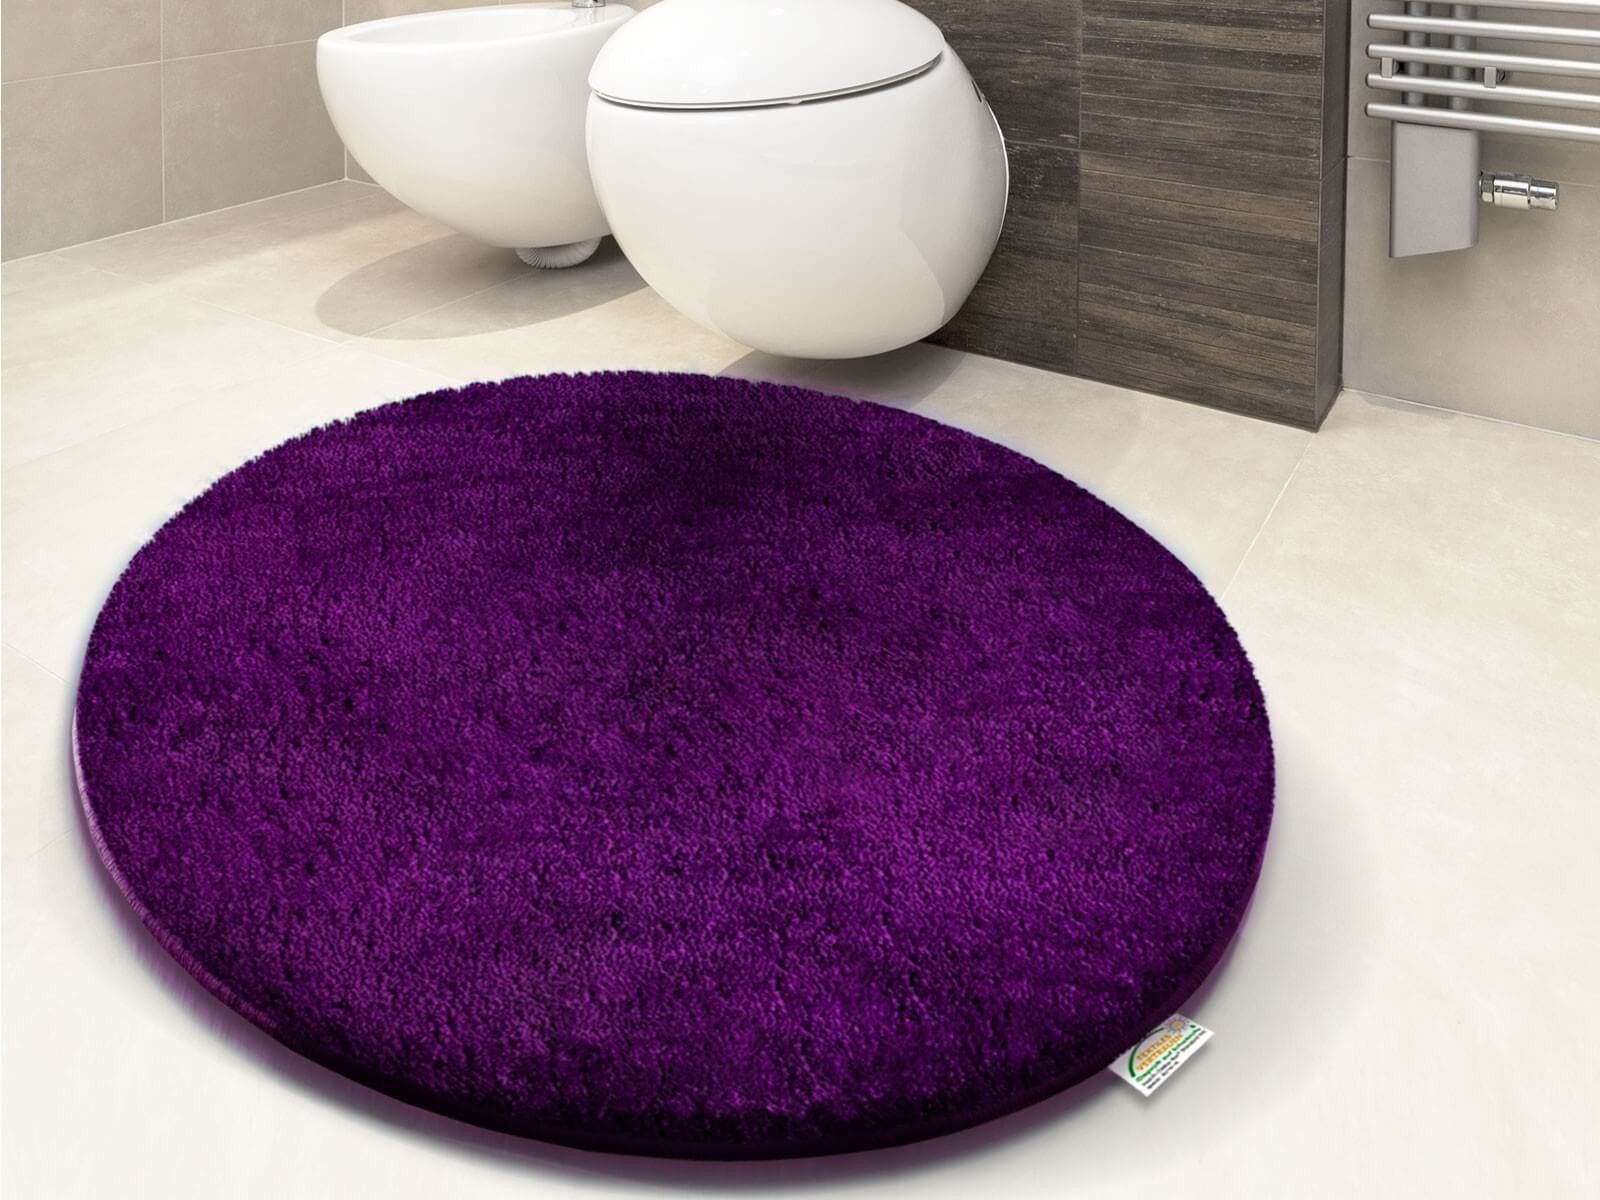 Purple Rugs For Bathroom Five Secrets You Will Not Want To Know About Purple Rugs For Bathro In 2021 Purple Bathrooms Purple Bathroom Rug Bathroom Rugs [ 1200 x 1600 Pixel ]